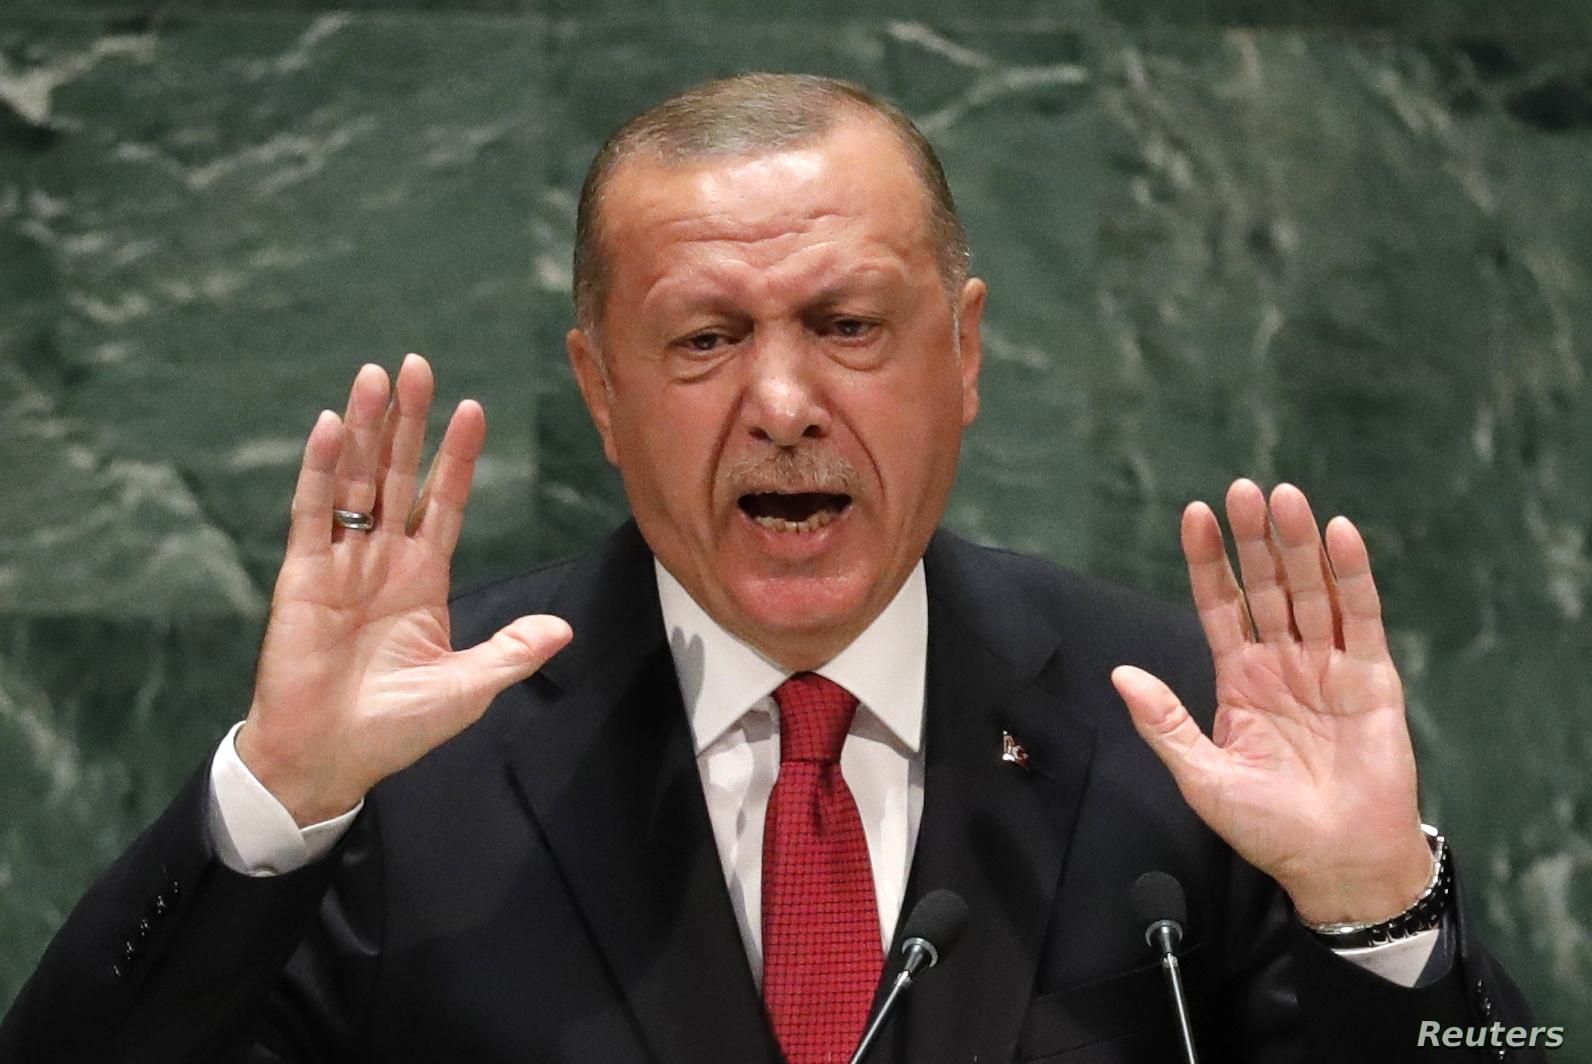 Președintele Turciei - Recep Tayyip Erdogan